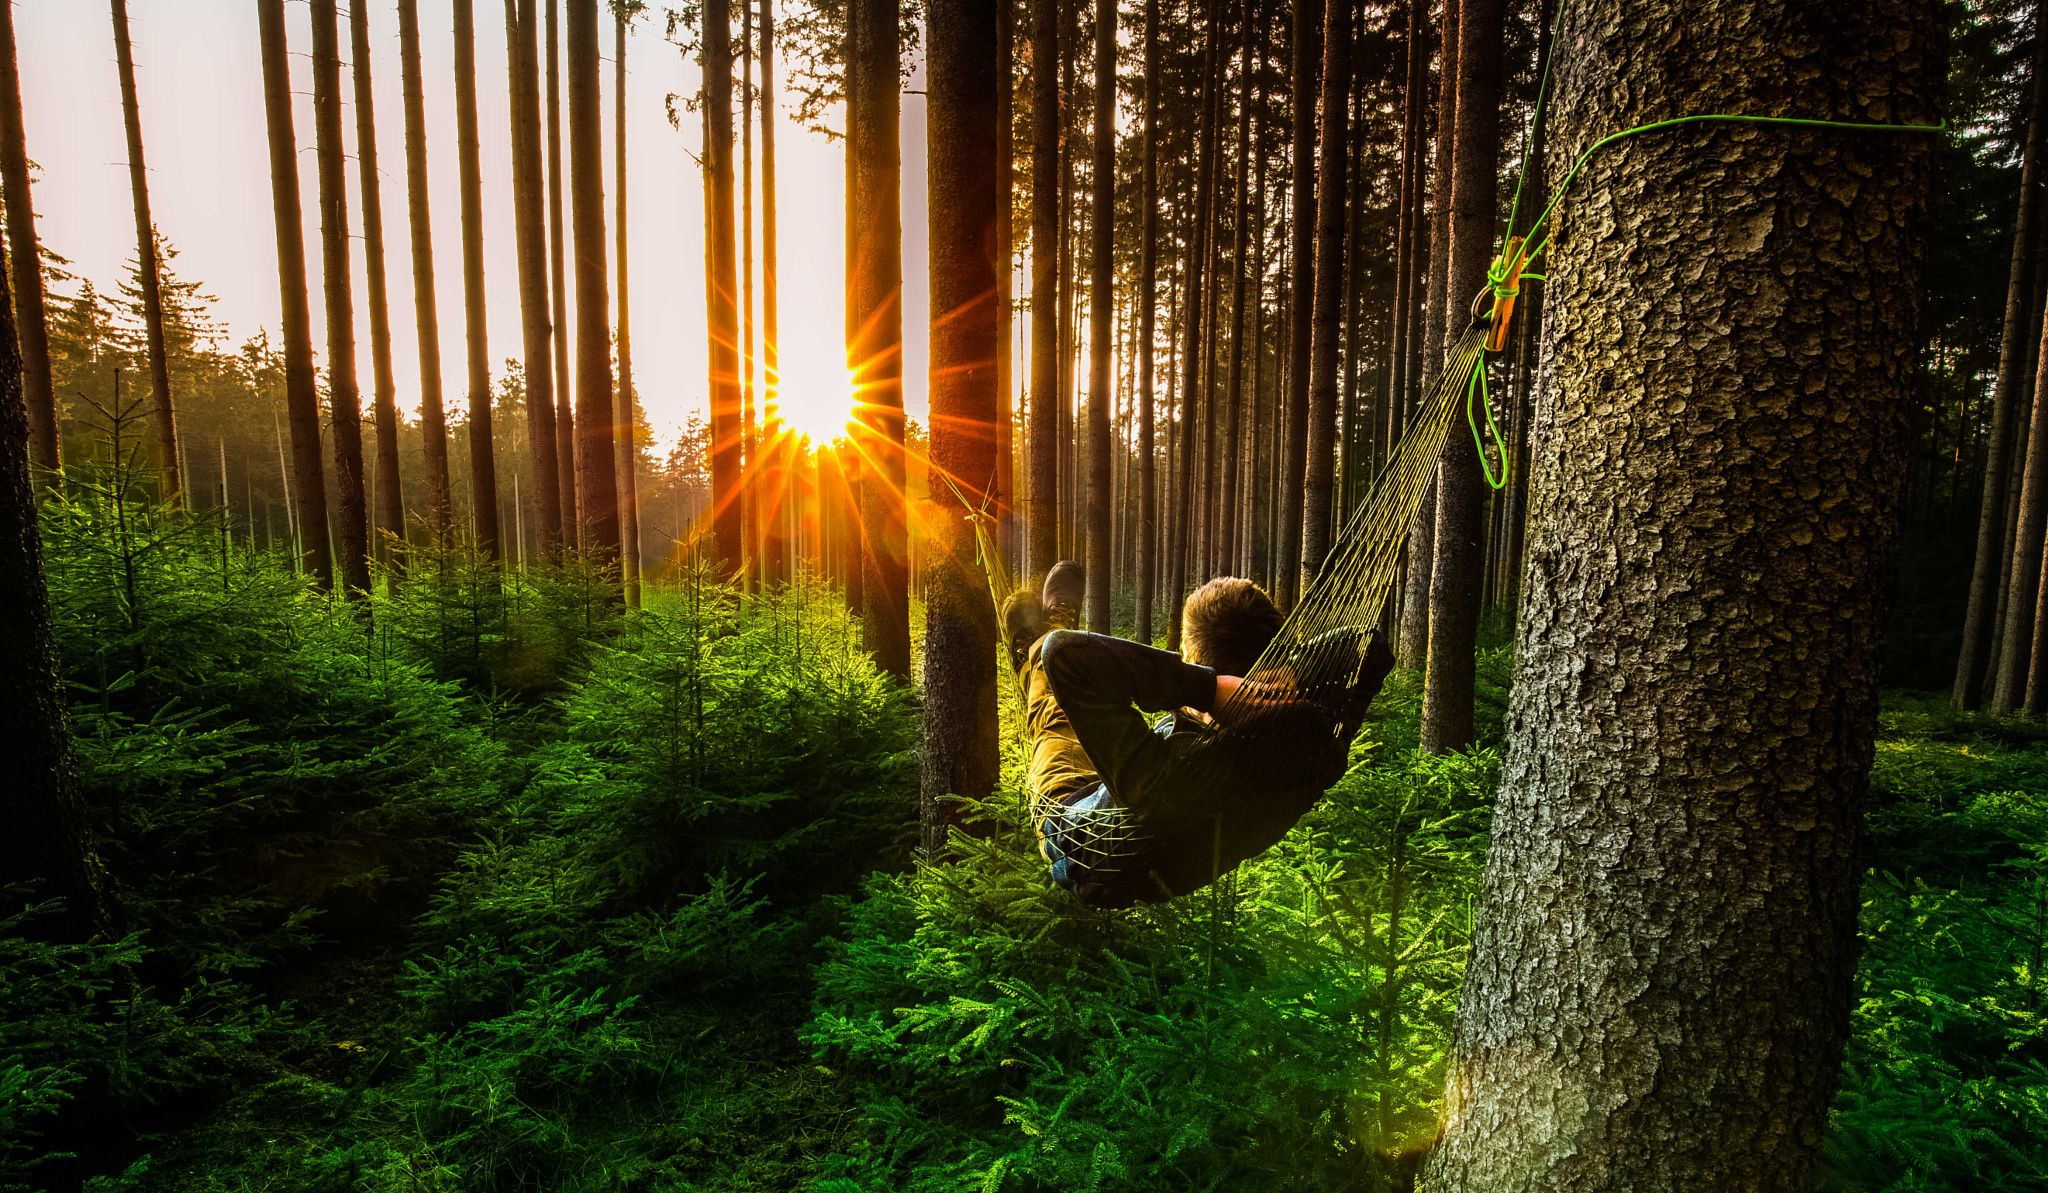 Photograph Heaven's Light by Mirko Fikentscher on 500px